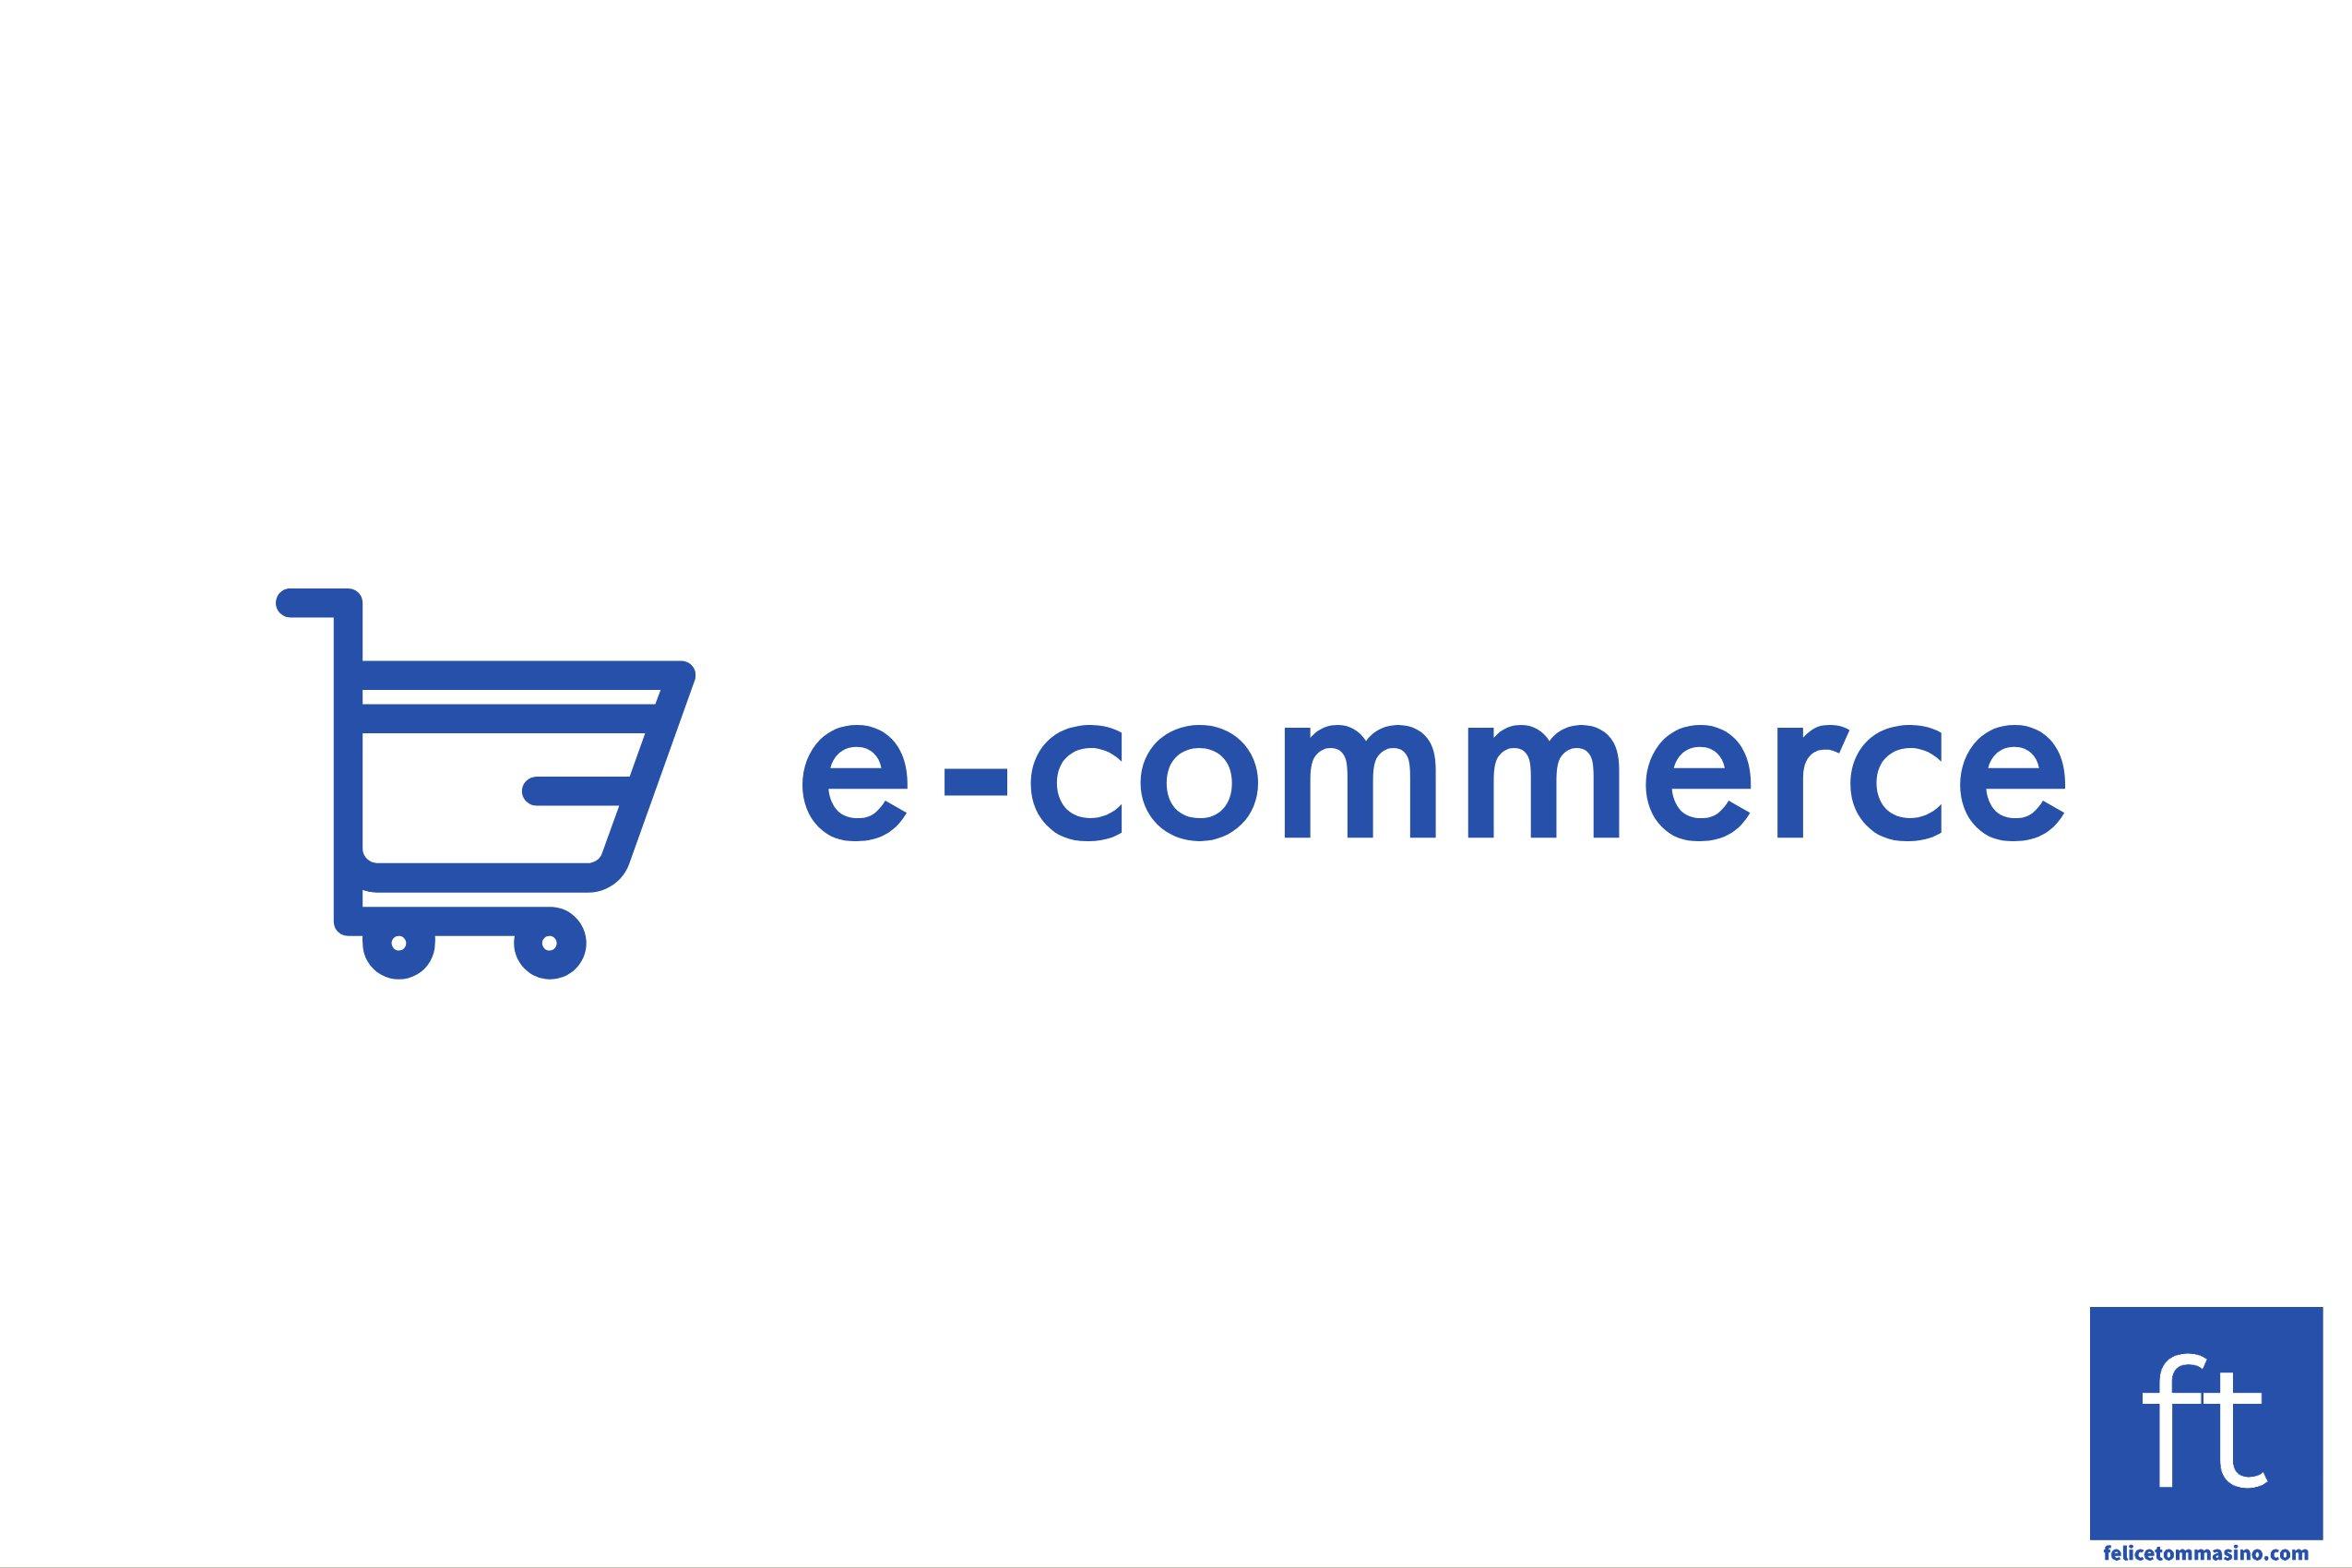 perché_come_aprire_un_negozio_online_ft